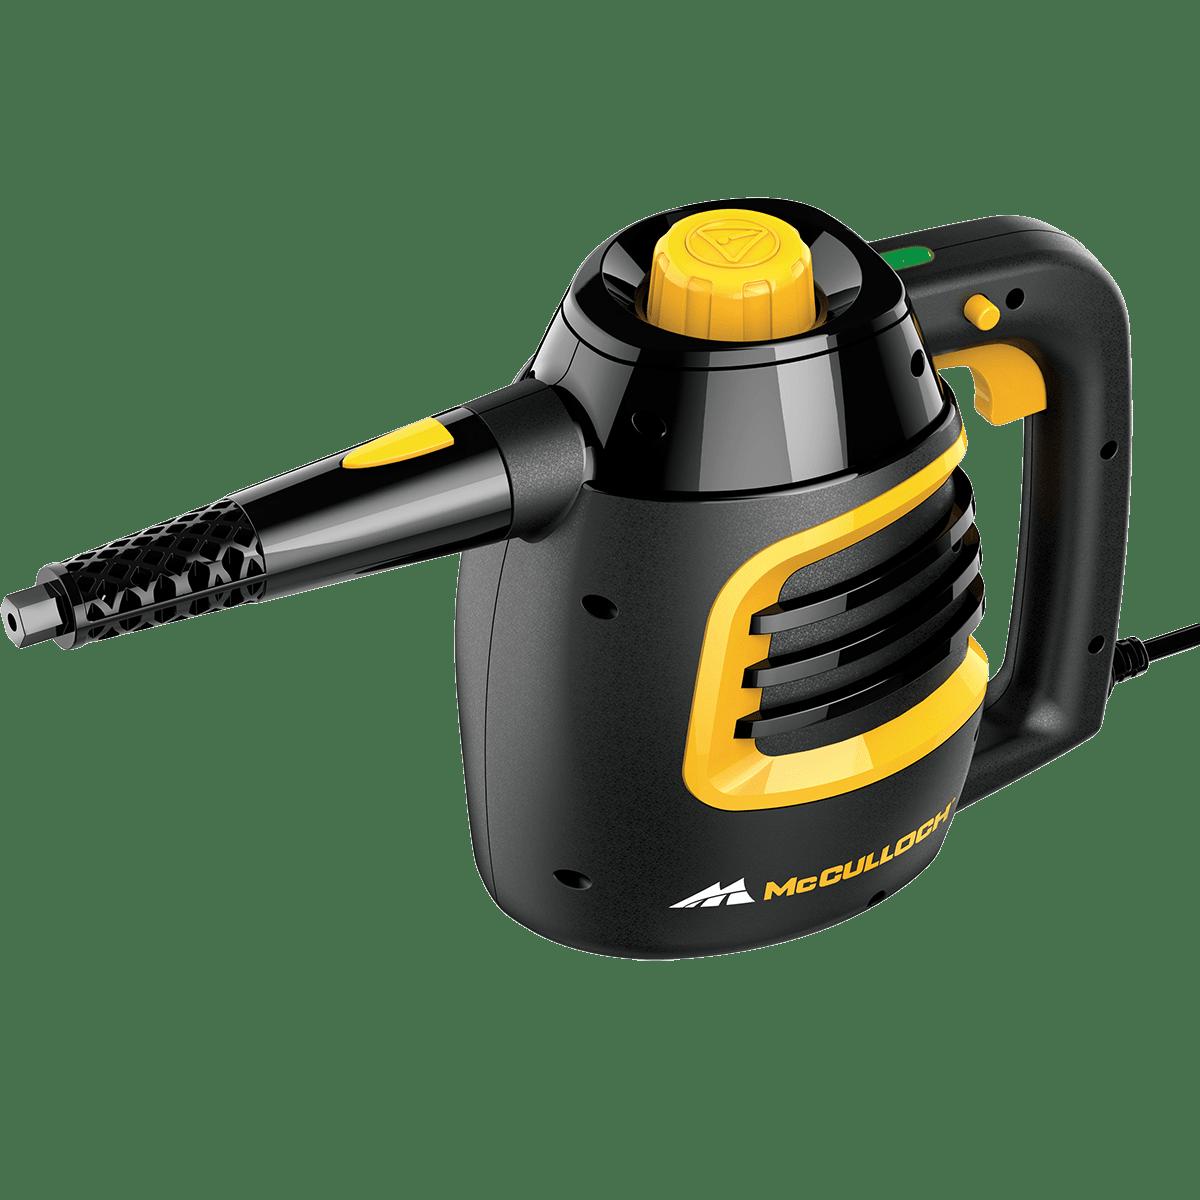 Mcculloch Mc1230 Handheld Steam Cleaner Sylvane